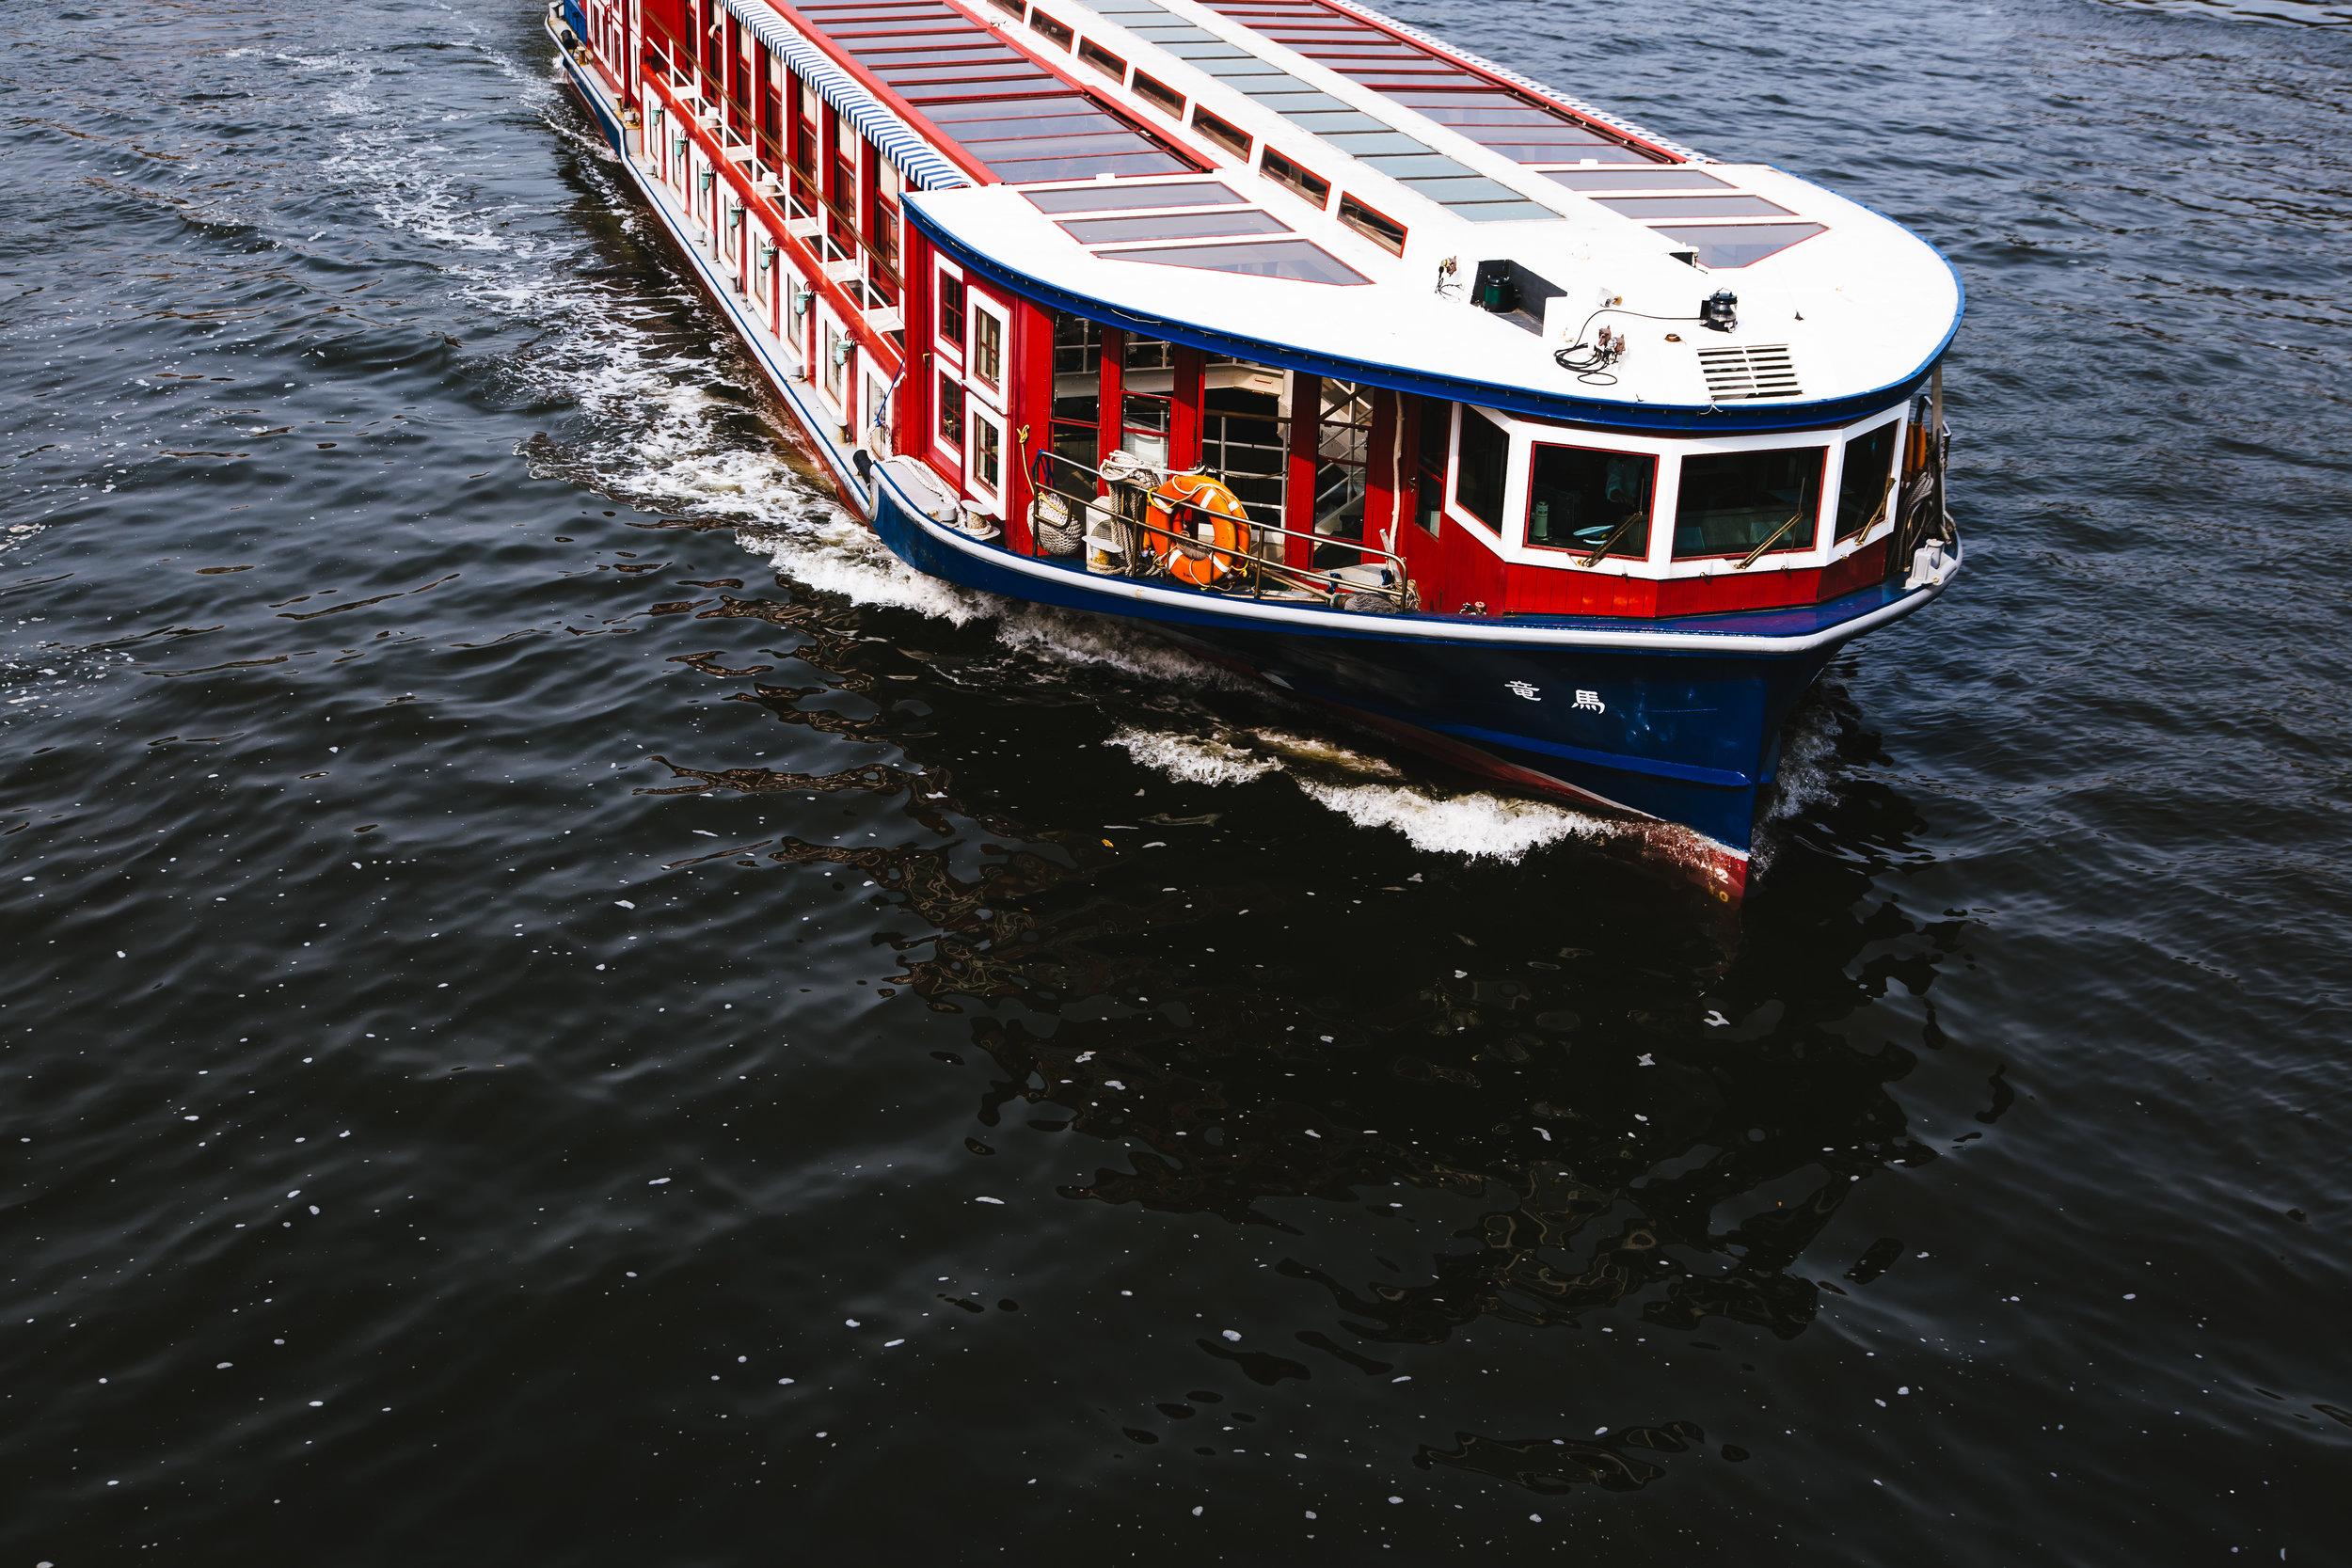 sumida-river-boat.jpg